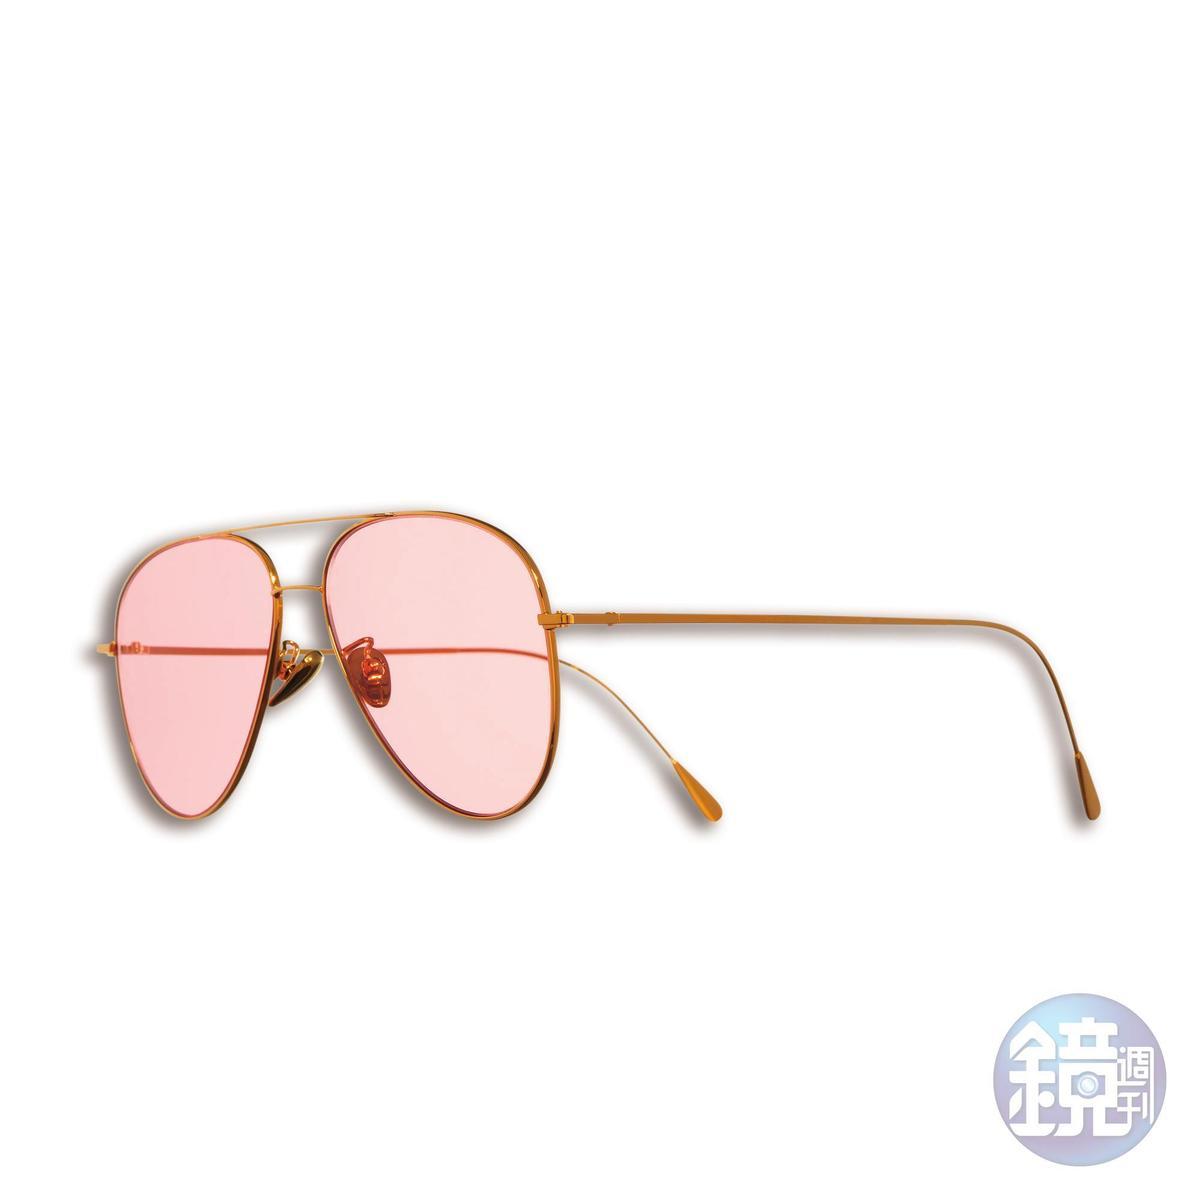 CUTLER & GROSS金色鏡框粉色鏡片飛行太陽眼鏡,NT$17,000。